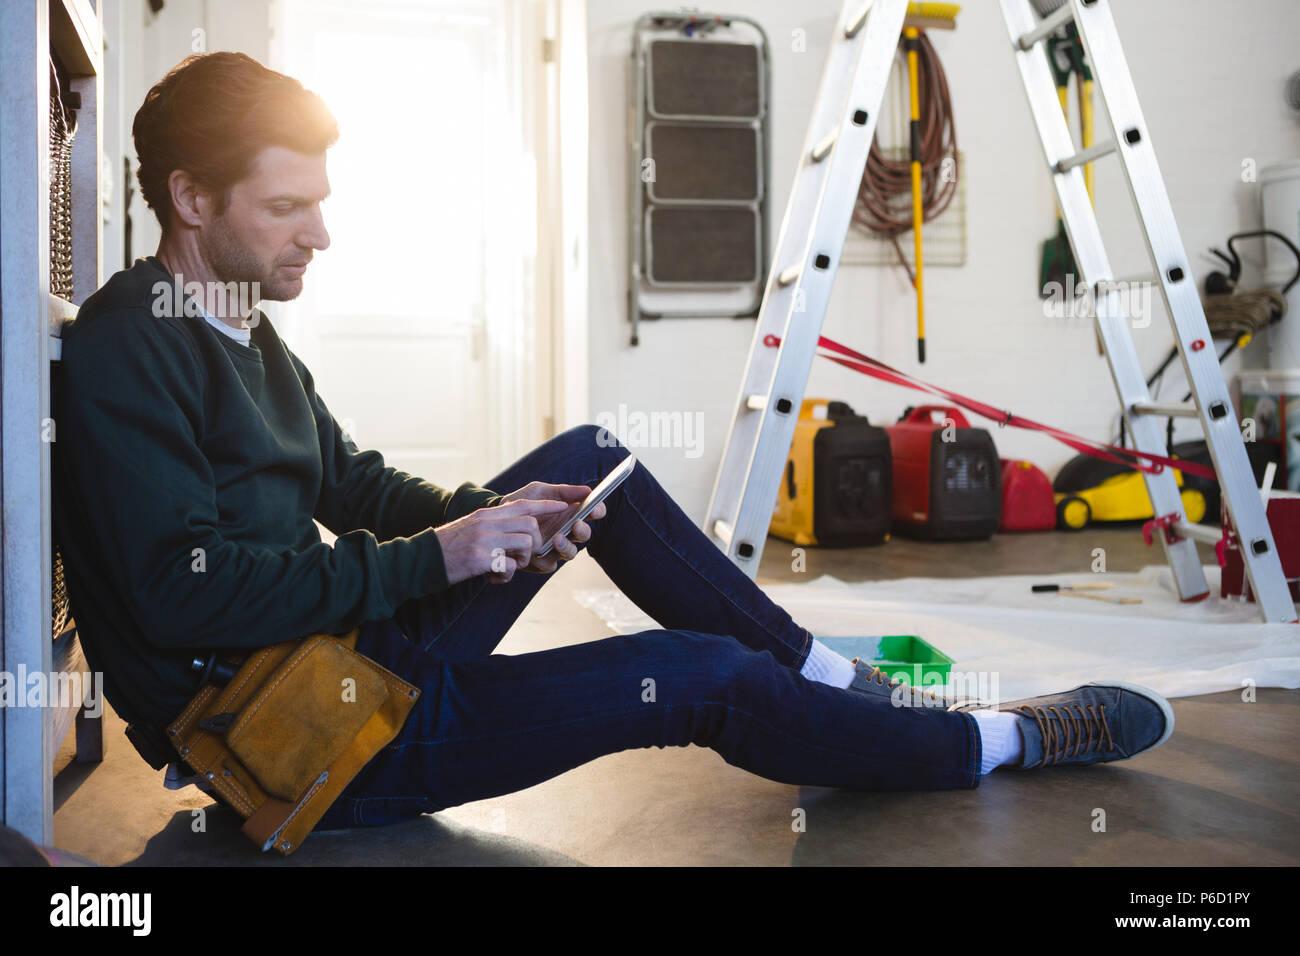 Male carpenter using mobile phone - Stock Image